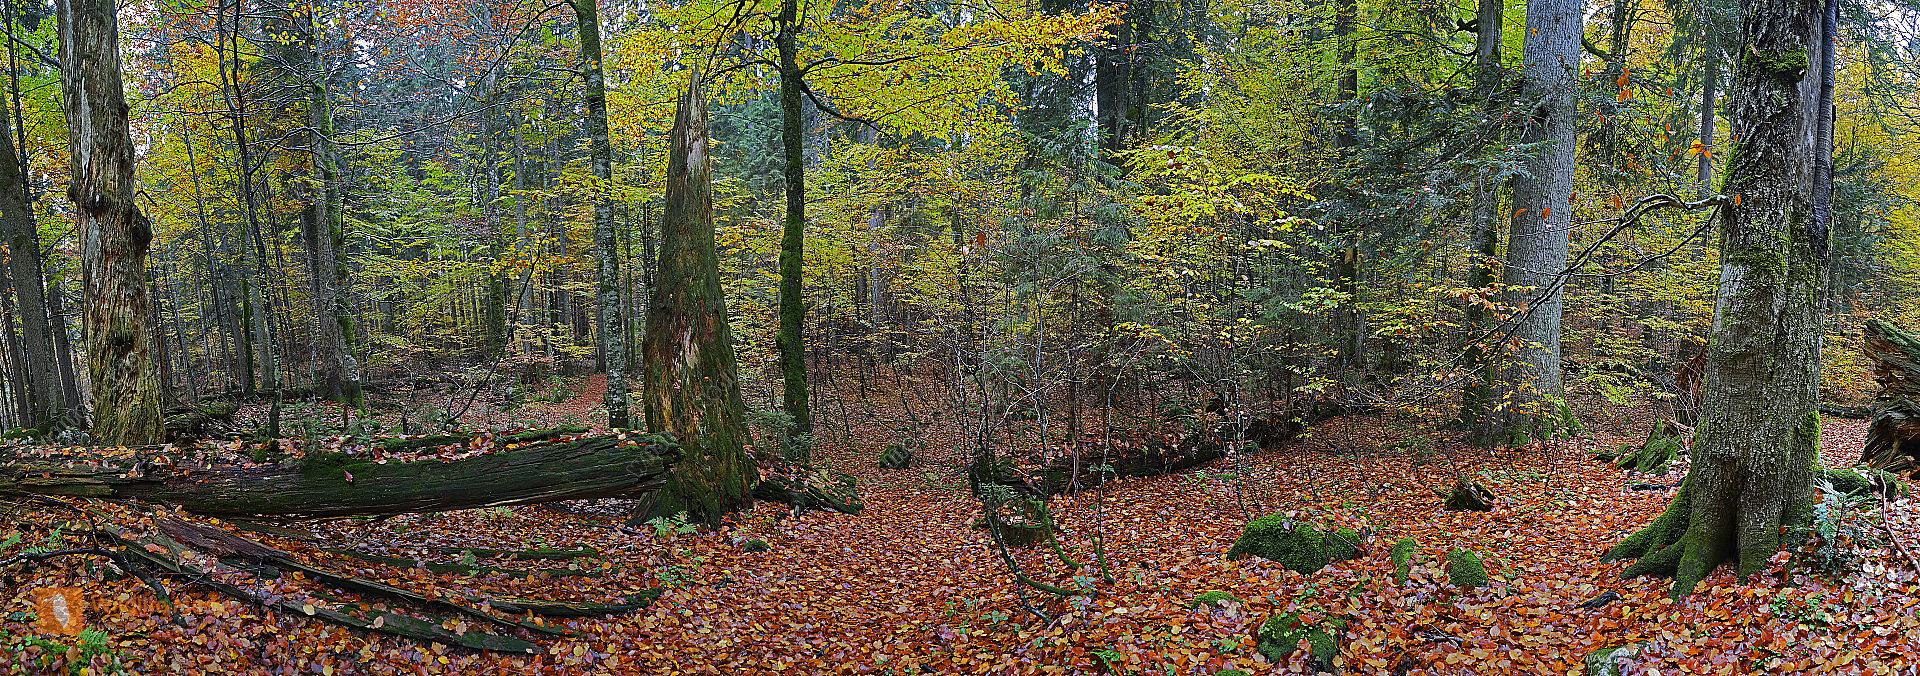 Europäischer Primärurwald Panorama